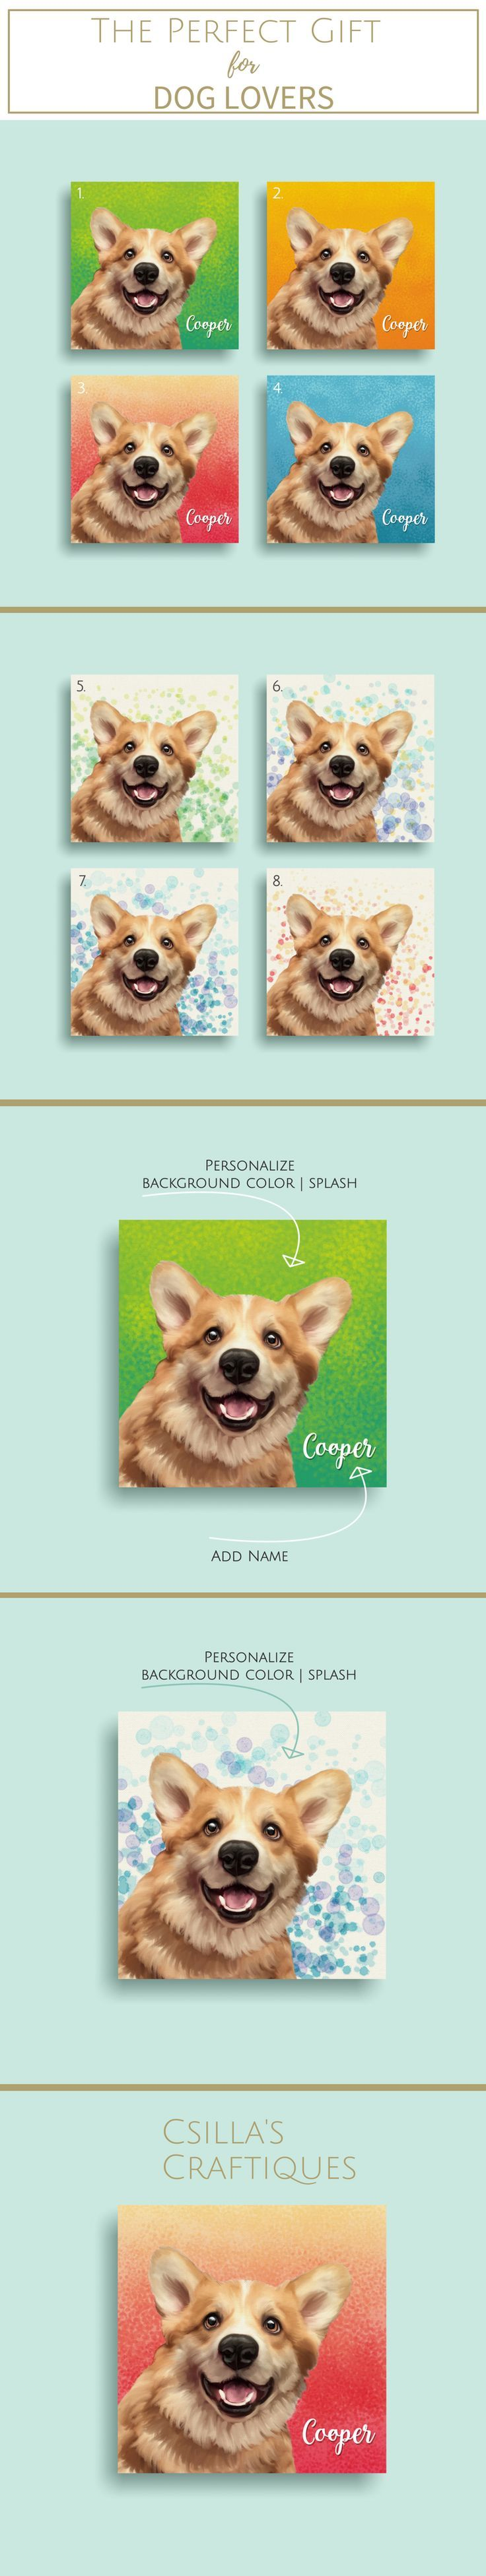 best dog art images on pinterest